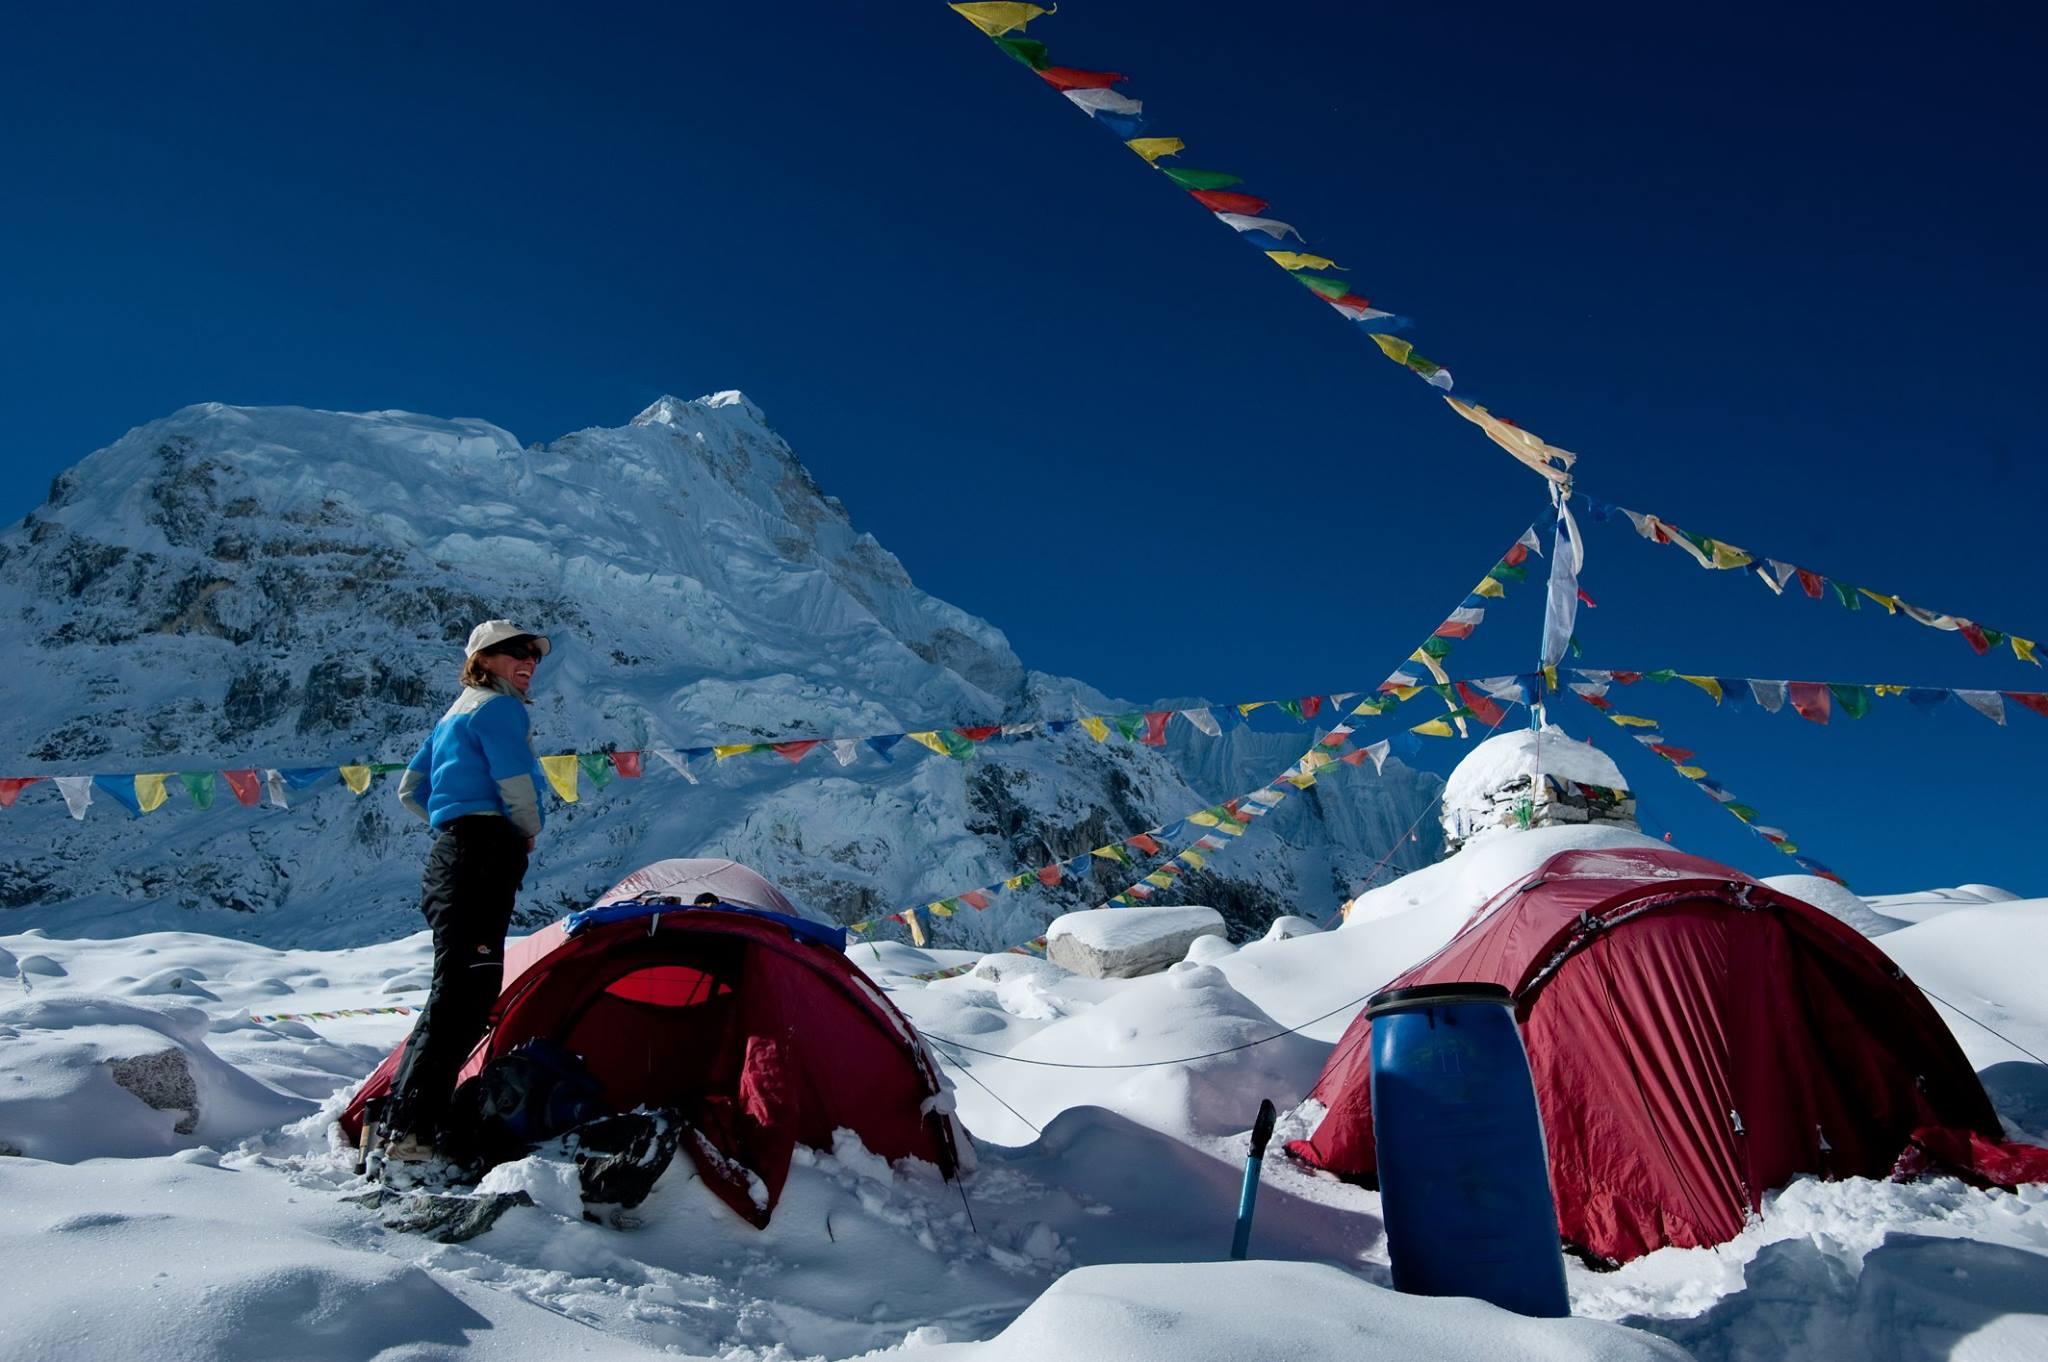 Ellen Miller 2009 Lhotse Expedition